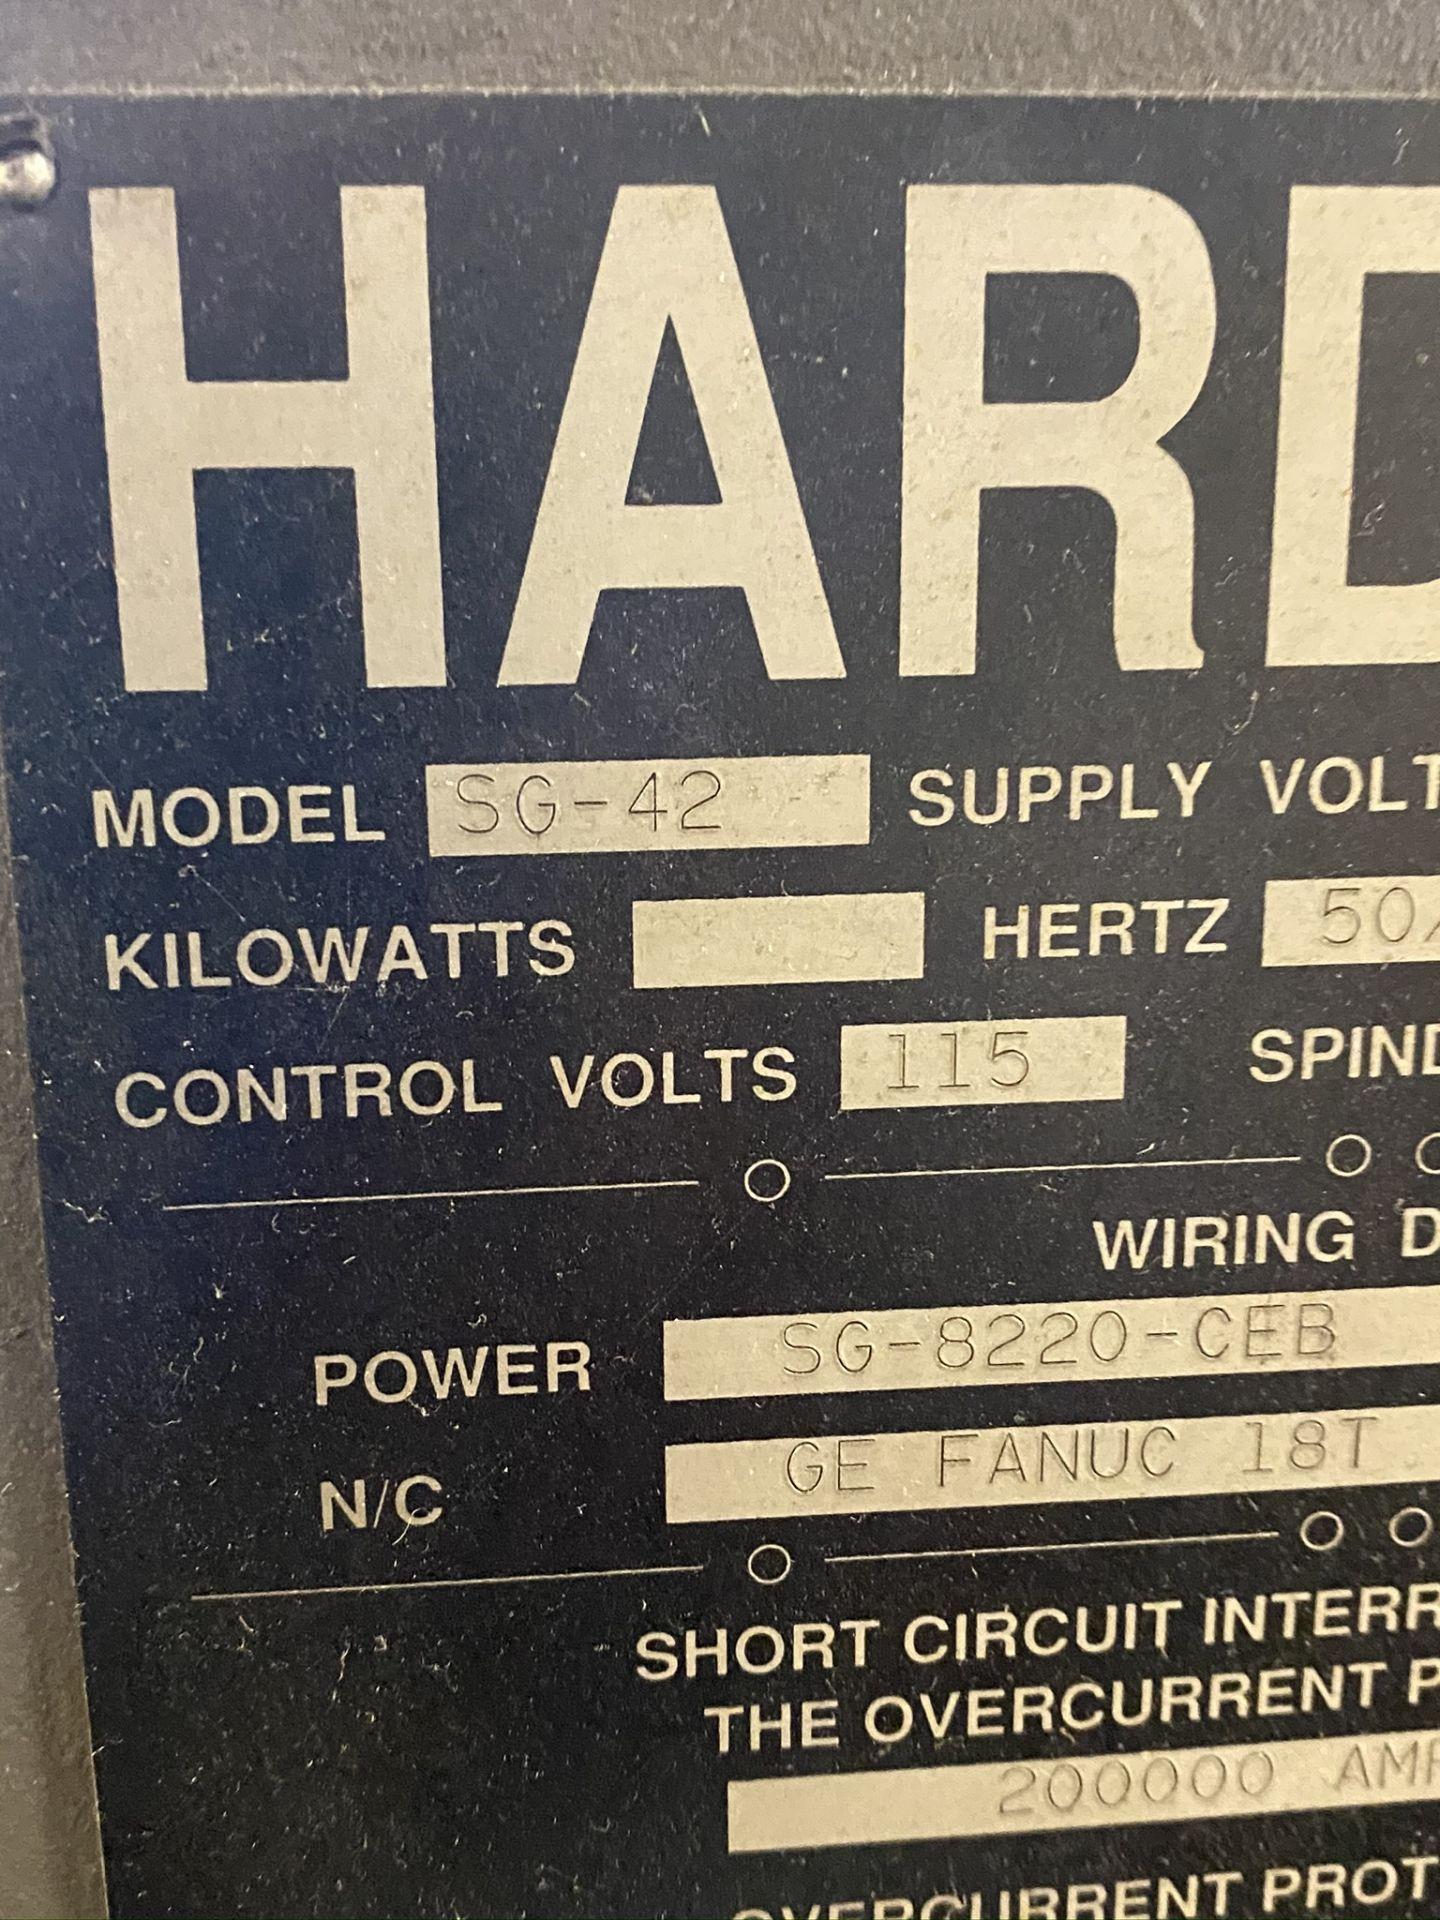 HARDINGE CONQUEST T-42 CNC LATHE, MODEL SG42, FANUC 18-T CNC CONTROL, 12-STATION TURRET, - Image 26 of 27